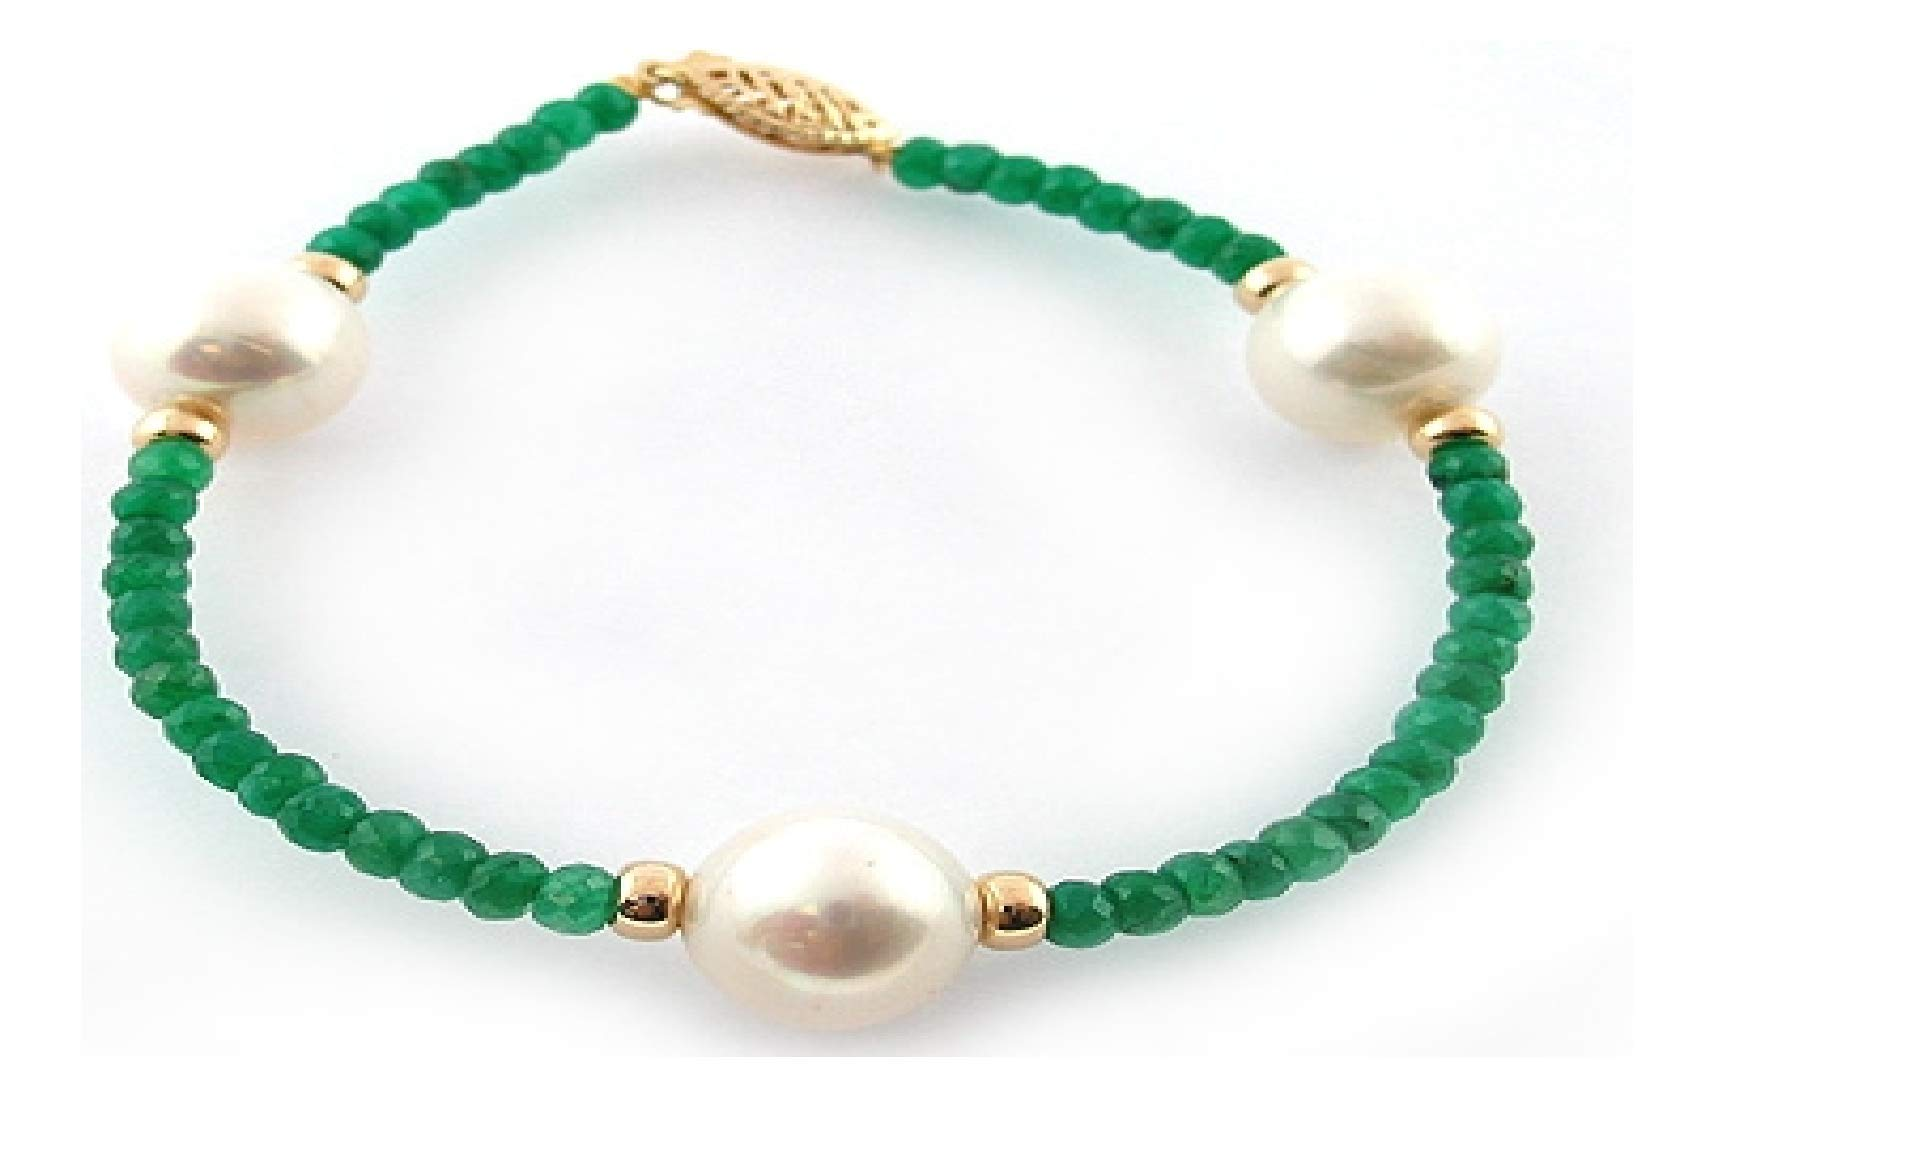 La Regis Jewelry 14k Yellow Gold 9-9.5mm White Freshwater Cultured Pearl 4mm Simulated Green Emerald Bracelet, 7.25''